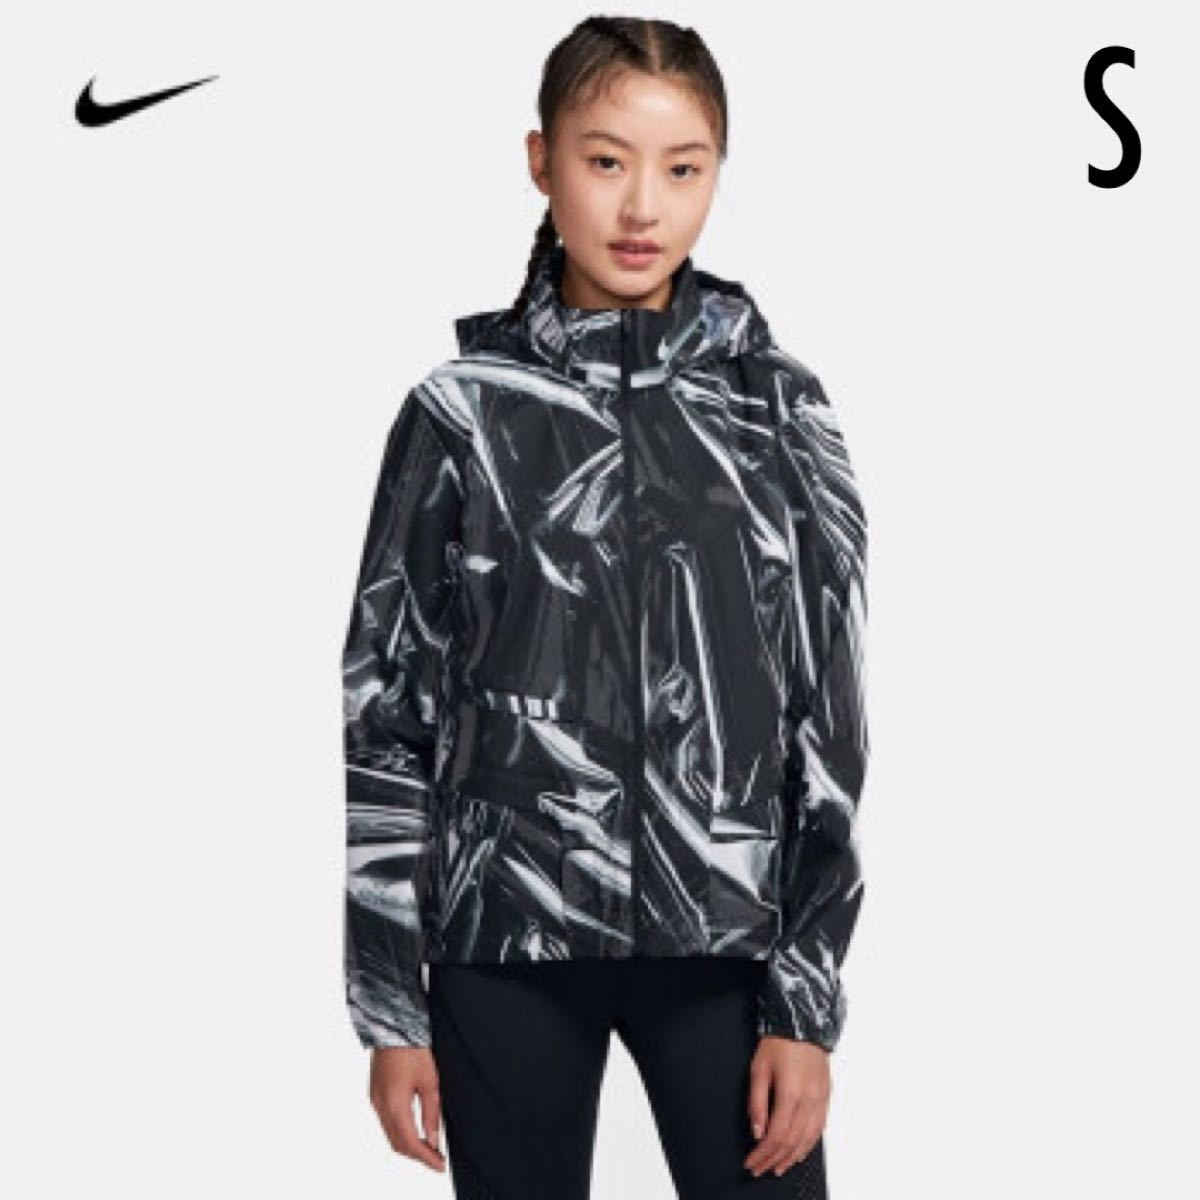 NIKE ナイキ シールド ランニング  ランニングジャケット Sサイズ